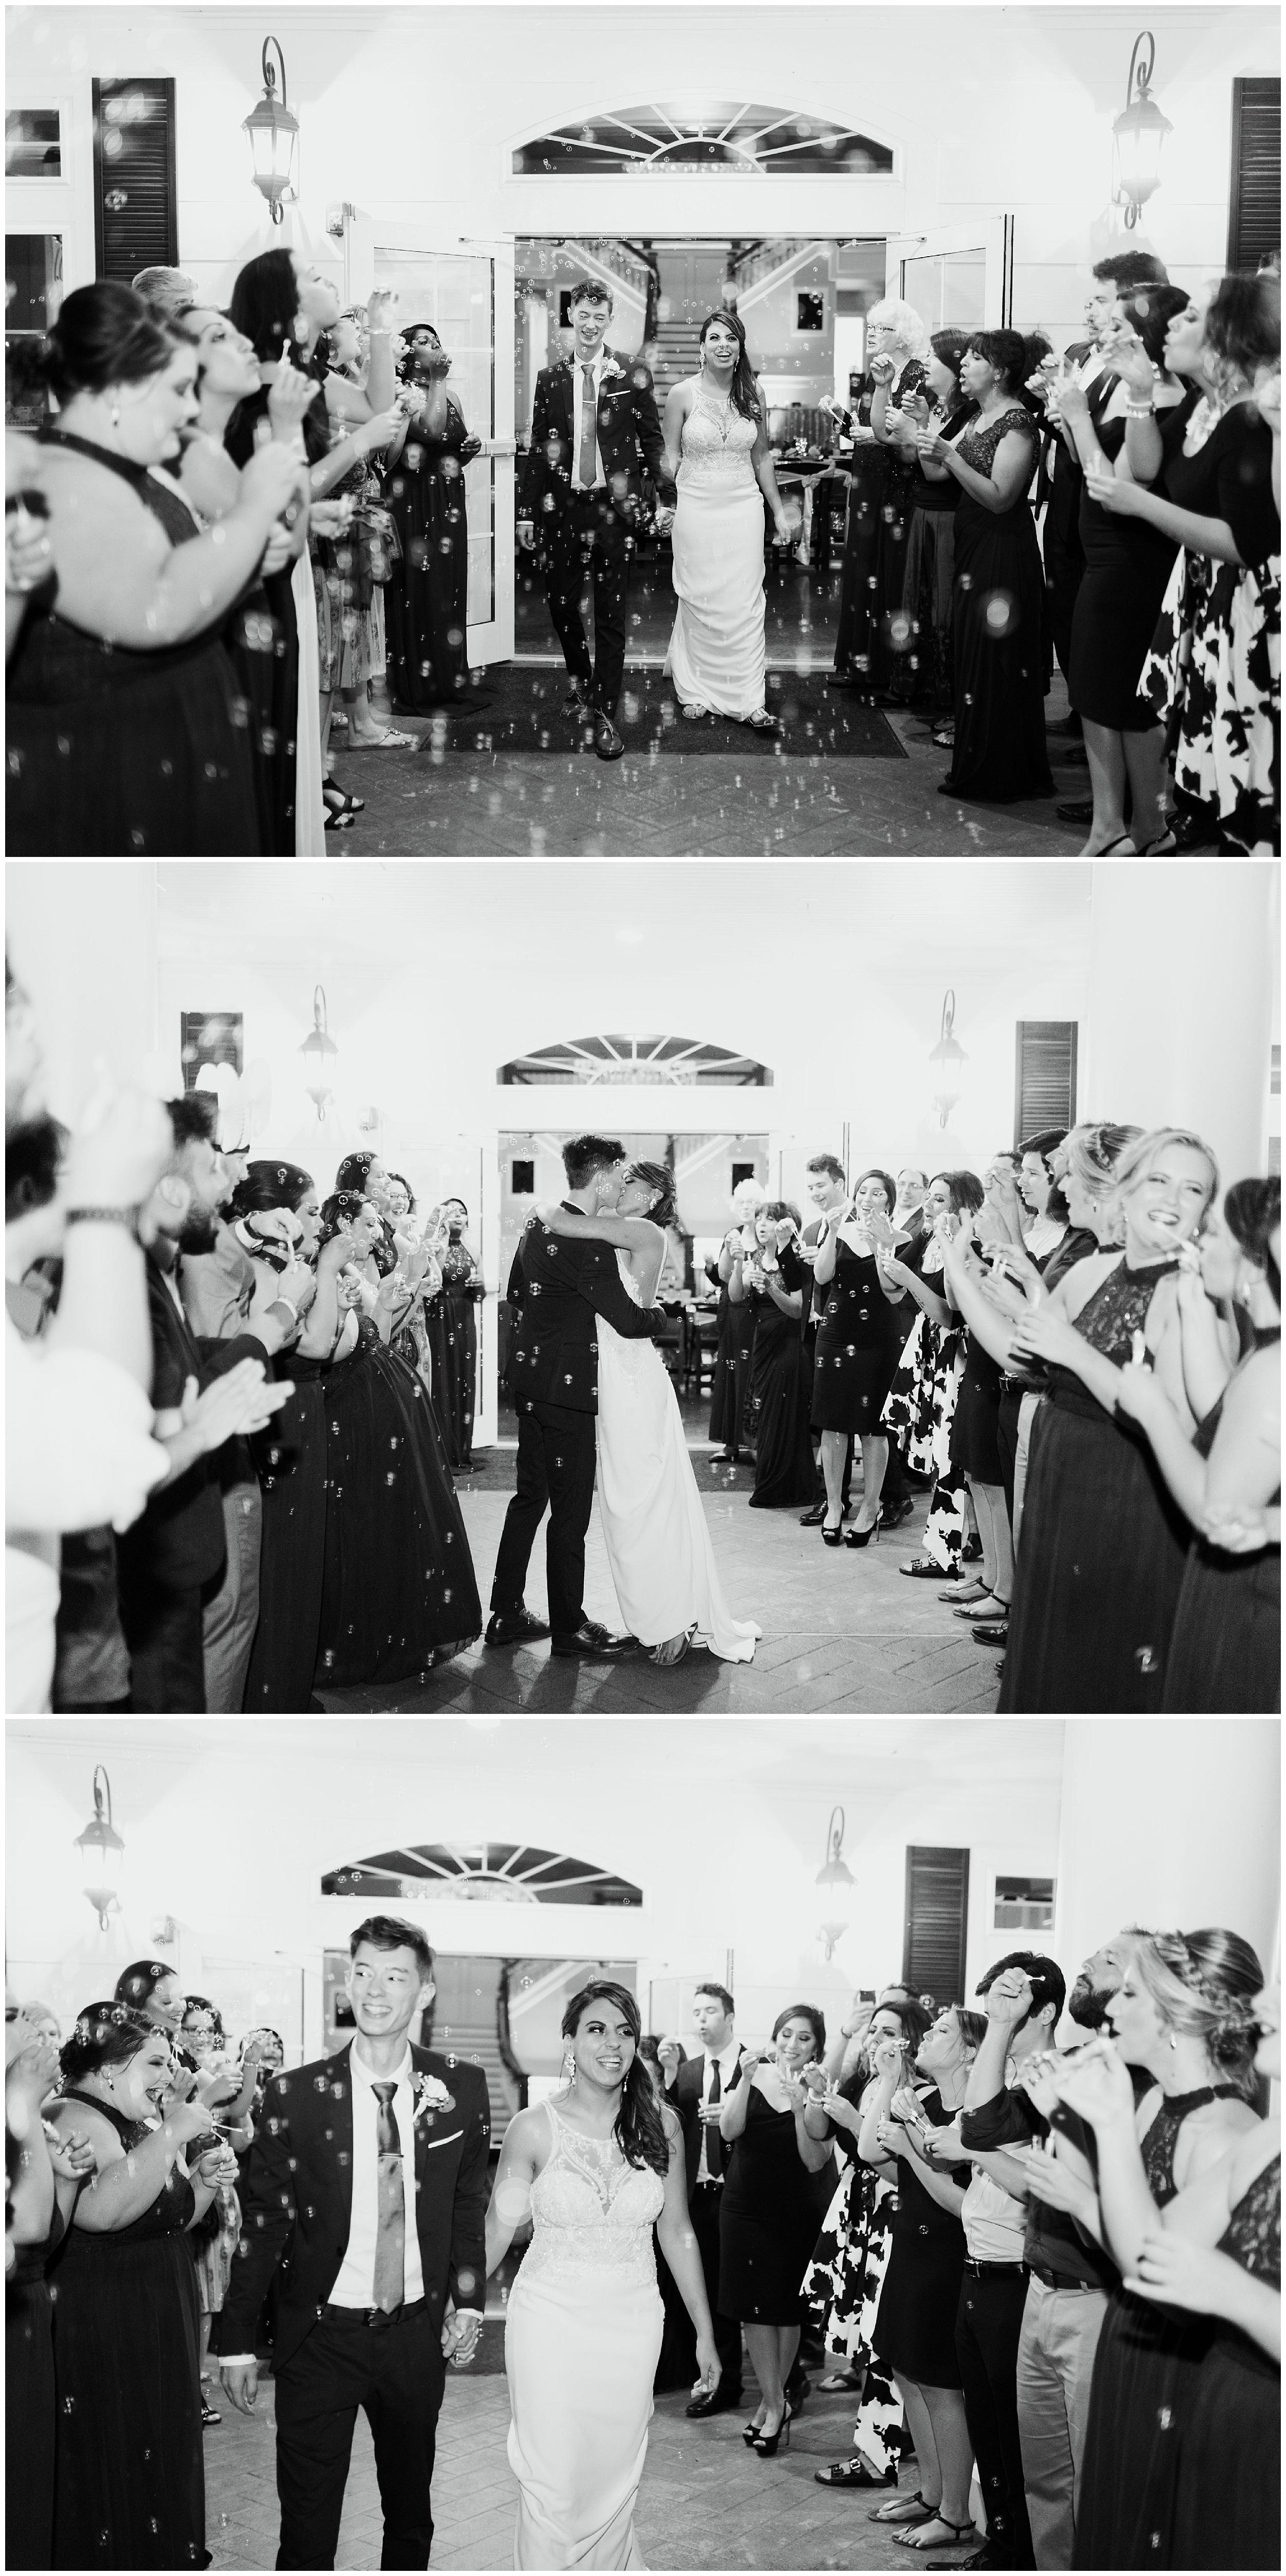 Fort Worth wedding photographer | Dallas wedding photographer | magnolia manor wedding |www.jordanmitchellphotography.com